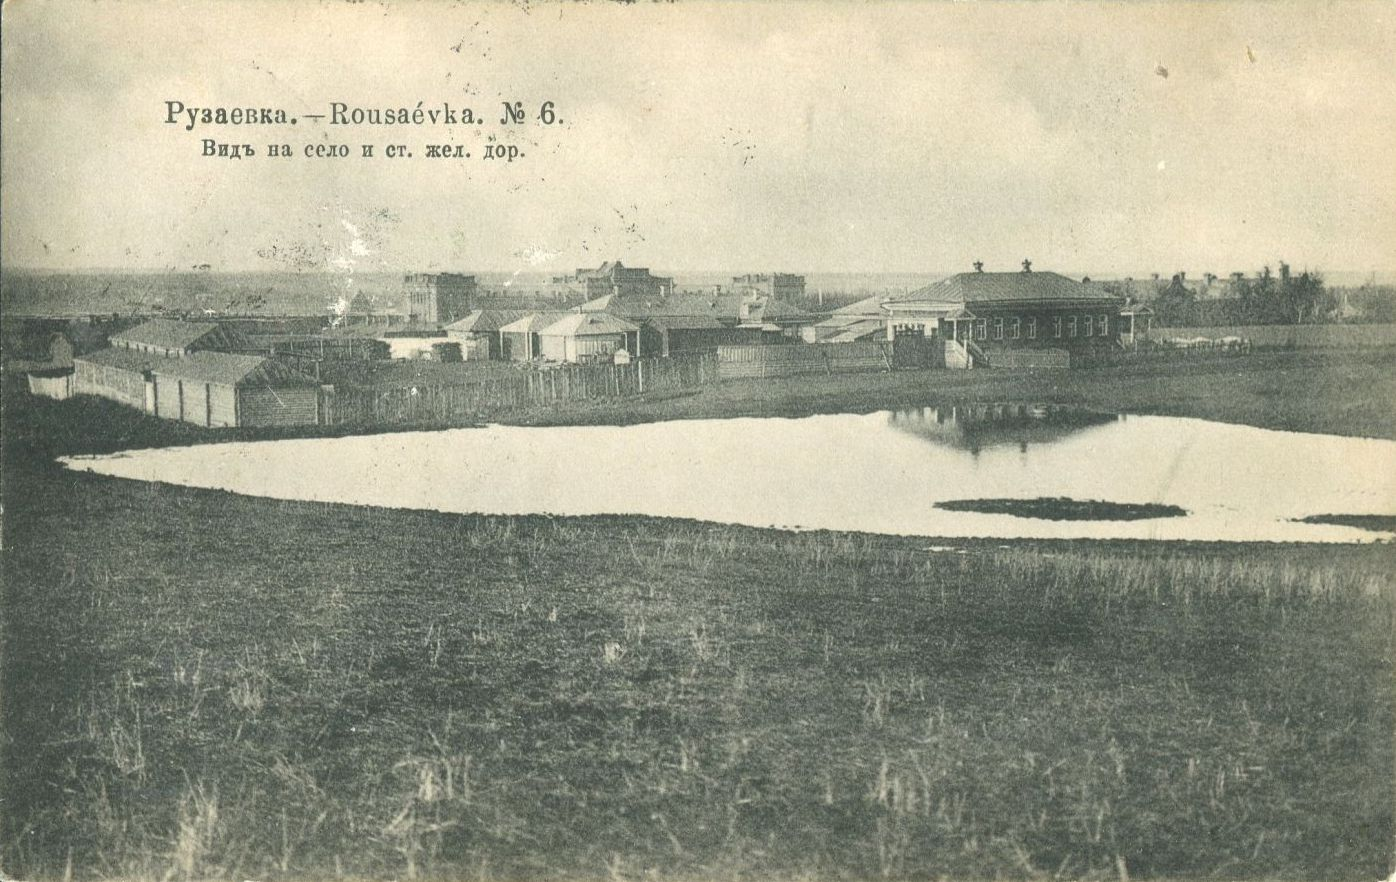 Рузаевка. Вид на село и ж-д станцию